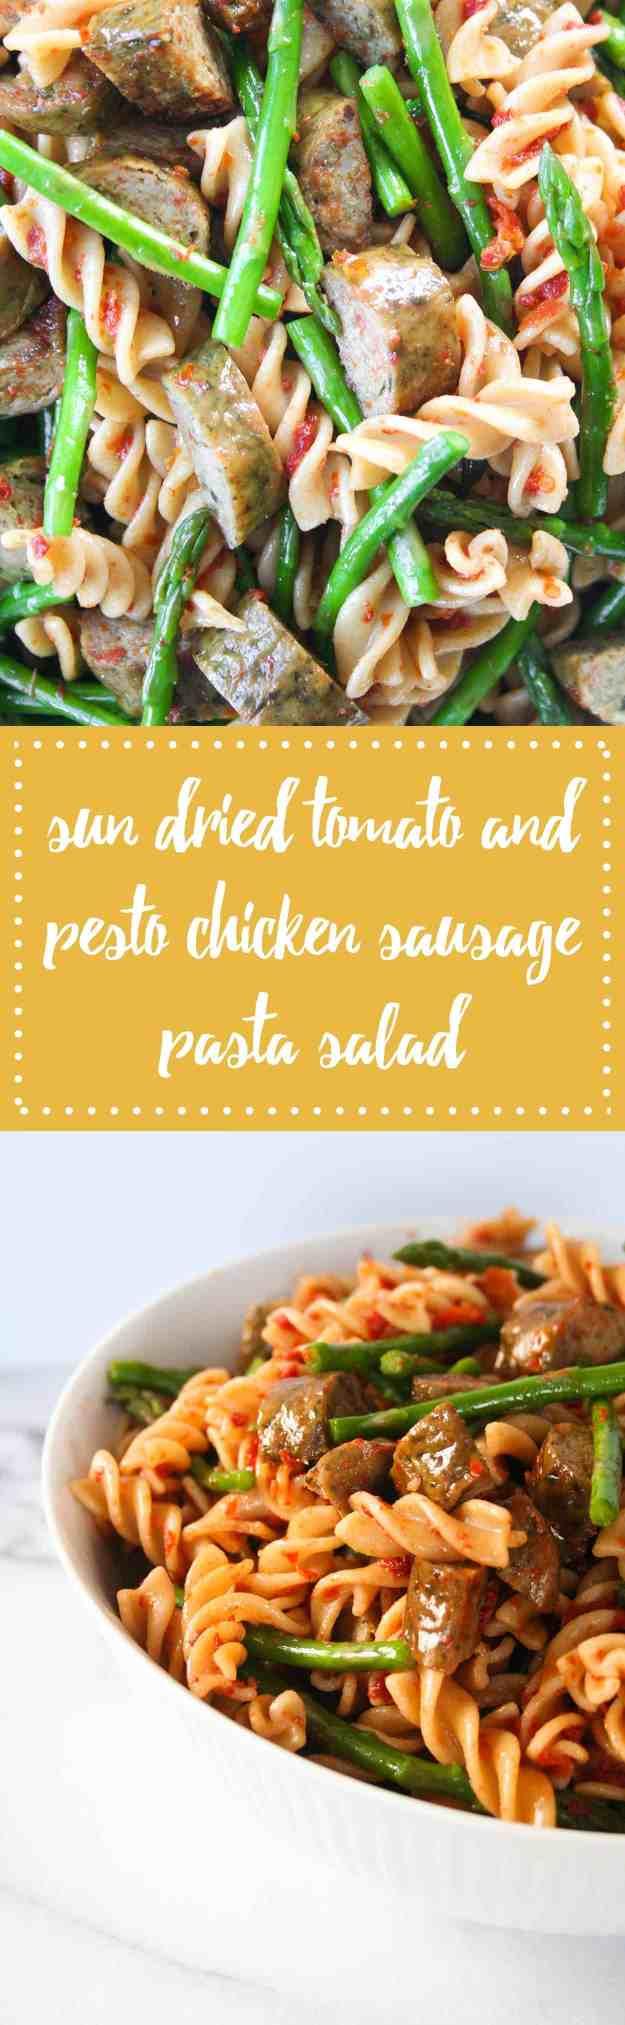 Sun Dried Tomato and Pesto Chicken Sausage Pasta Salad   Hungry by Nature